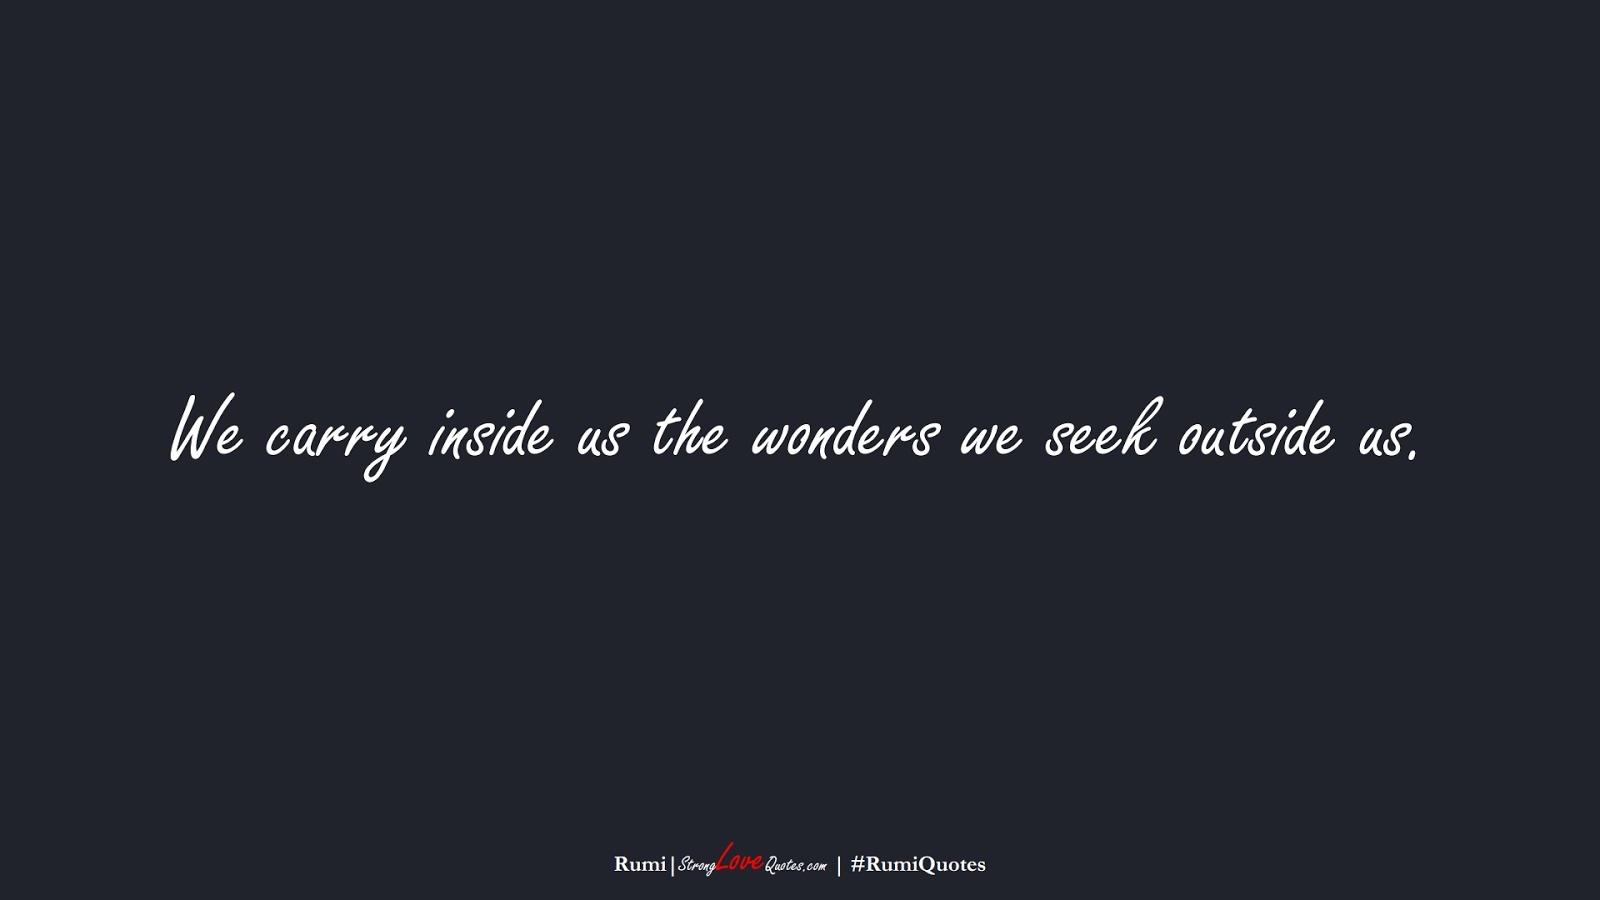 We carry inside us the wonders we seek outside us. (Rumi);  #RumiQuotes